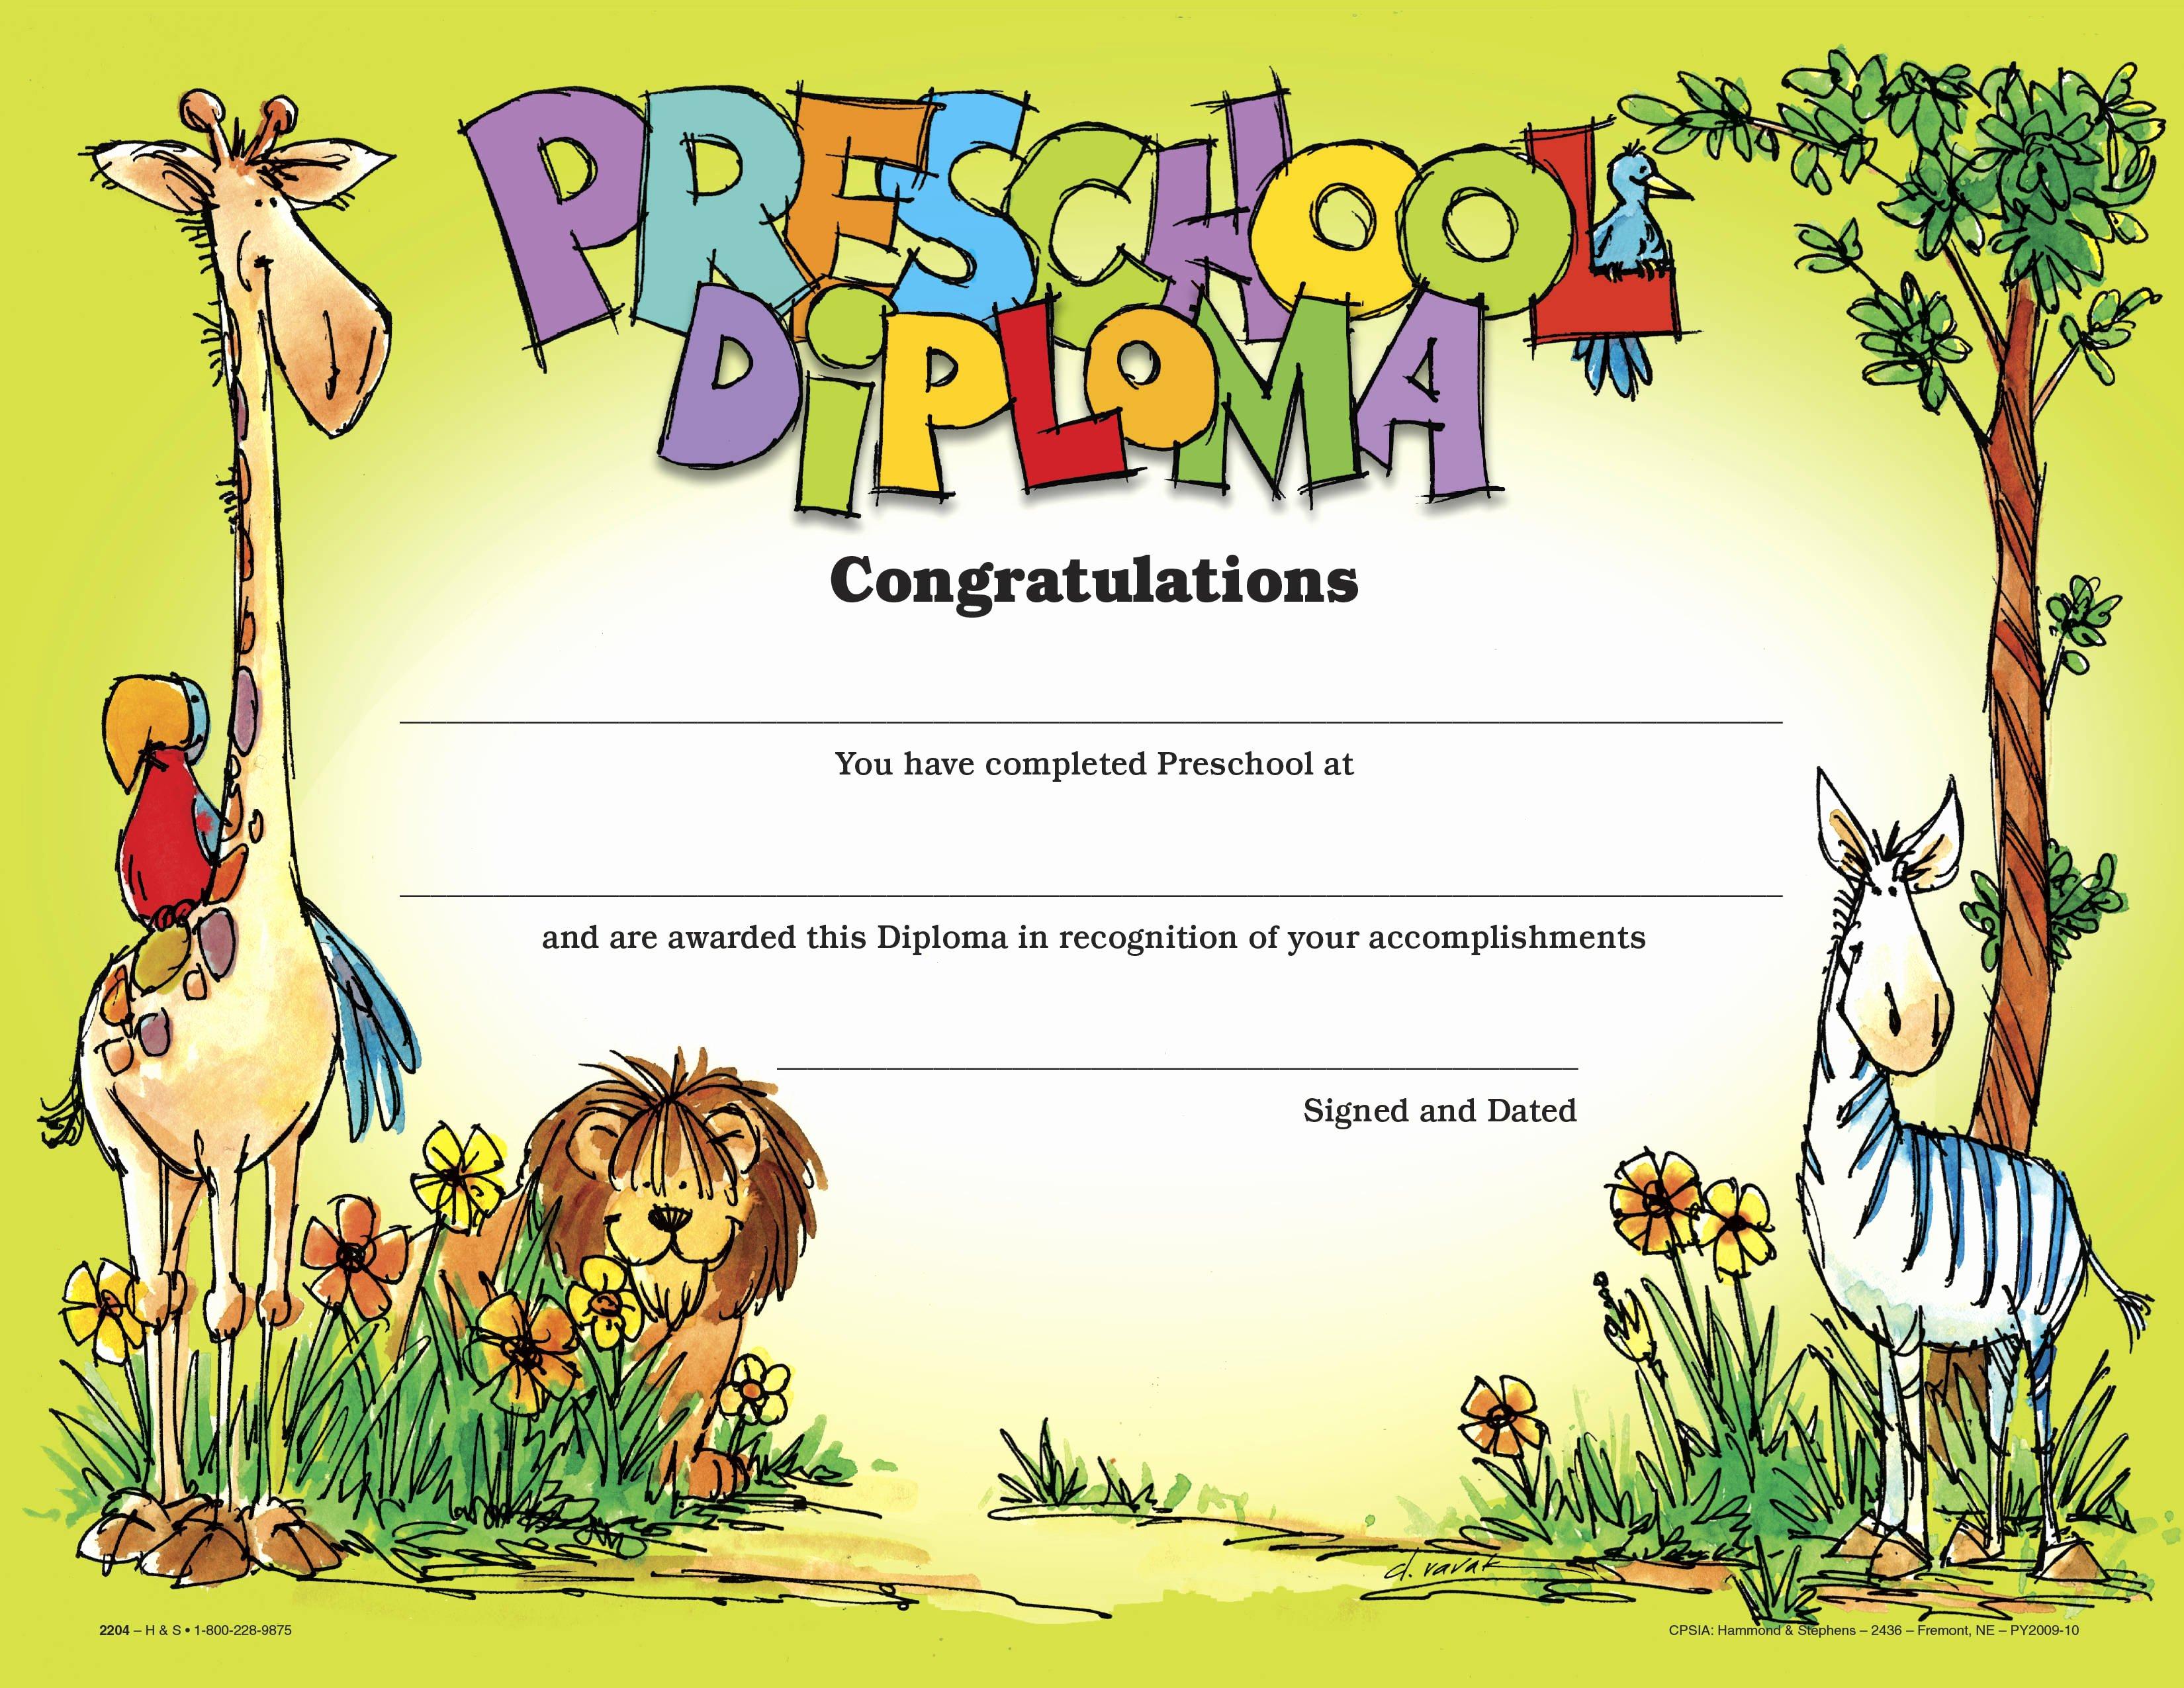 Preschool Diploma Template Word Elegant Diploma Preschool Diploma Template